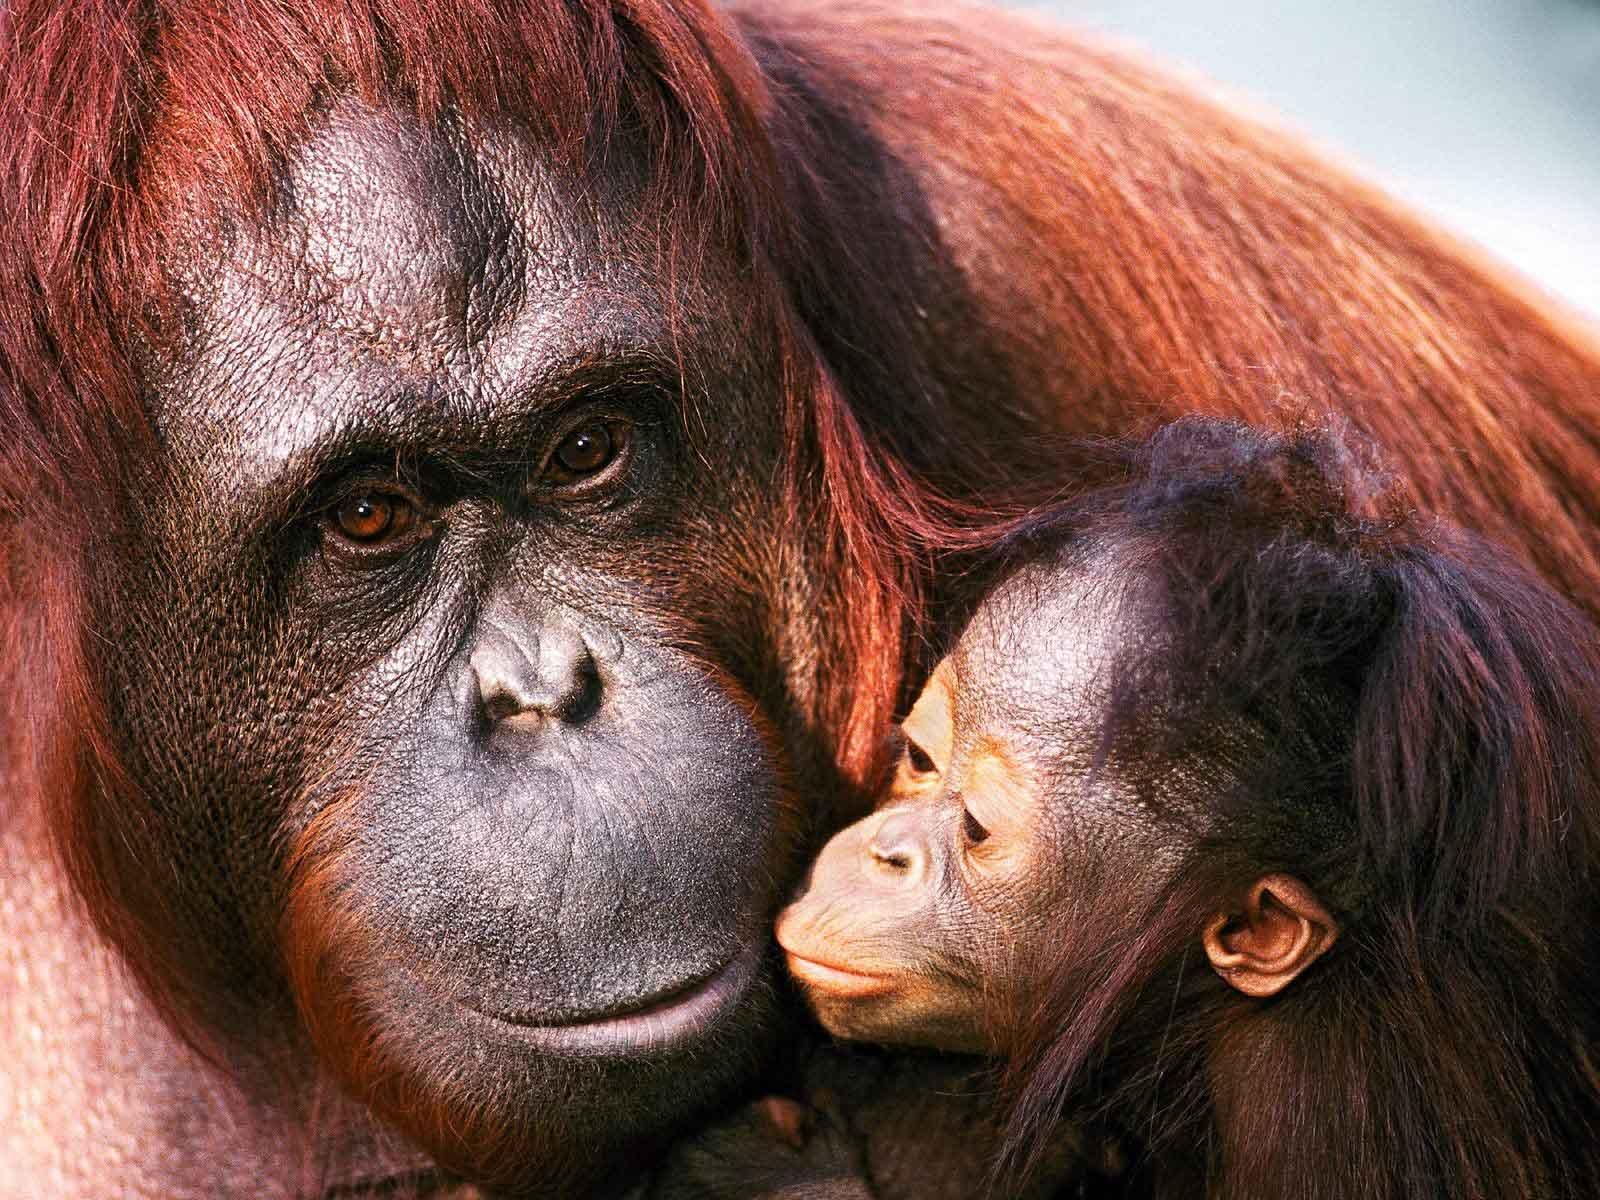 Funny Gorilla Wallpaper For Desktop Funny Animal